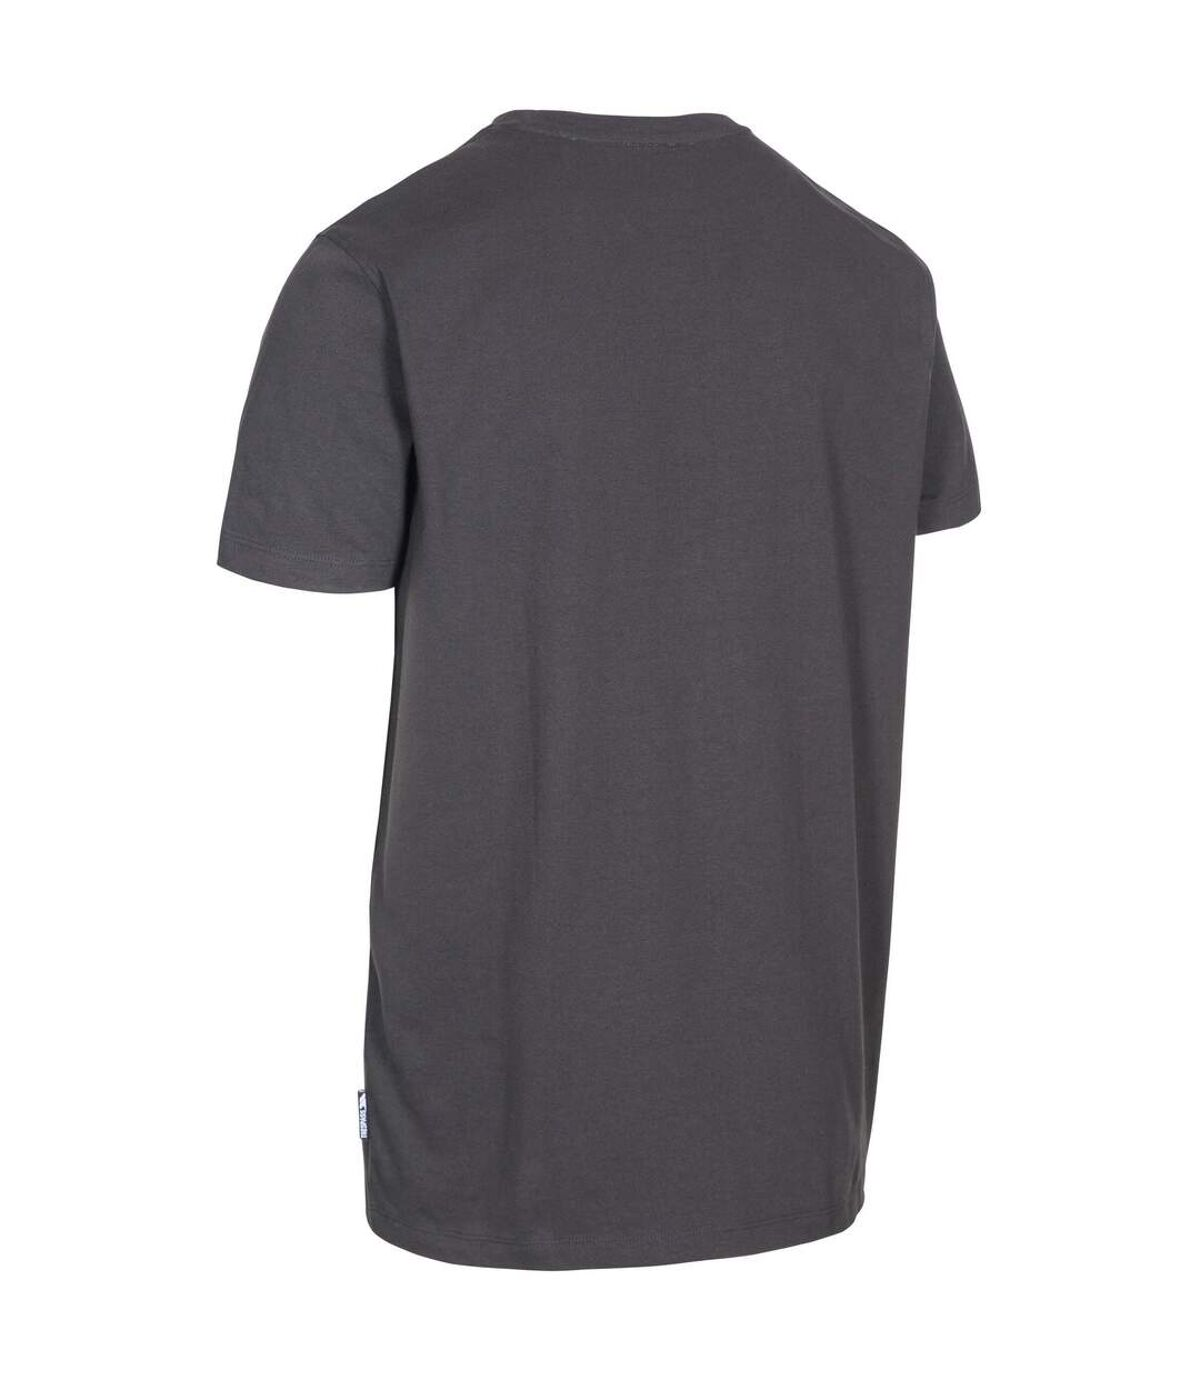 Trespass Mens Bonnhilly T-Shirt (Black) - UTTP4966